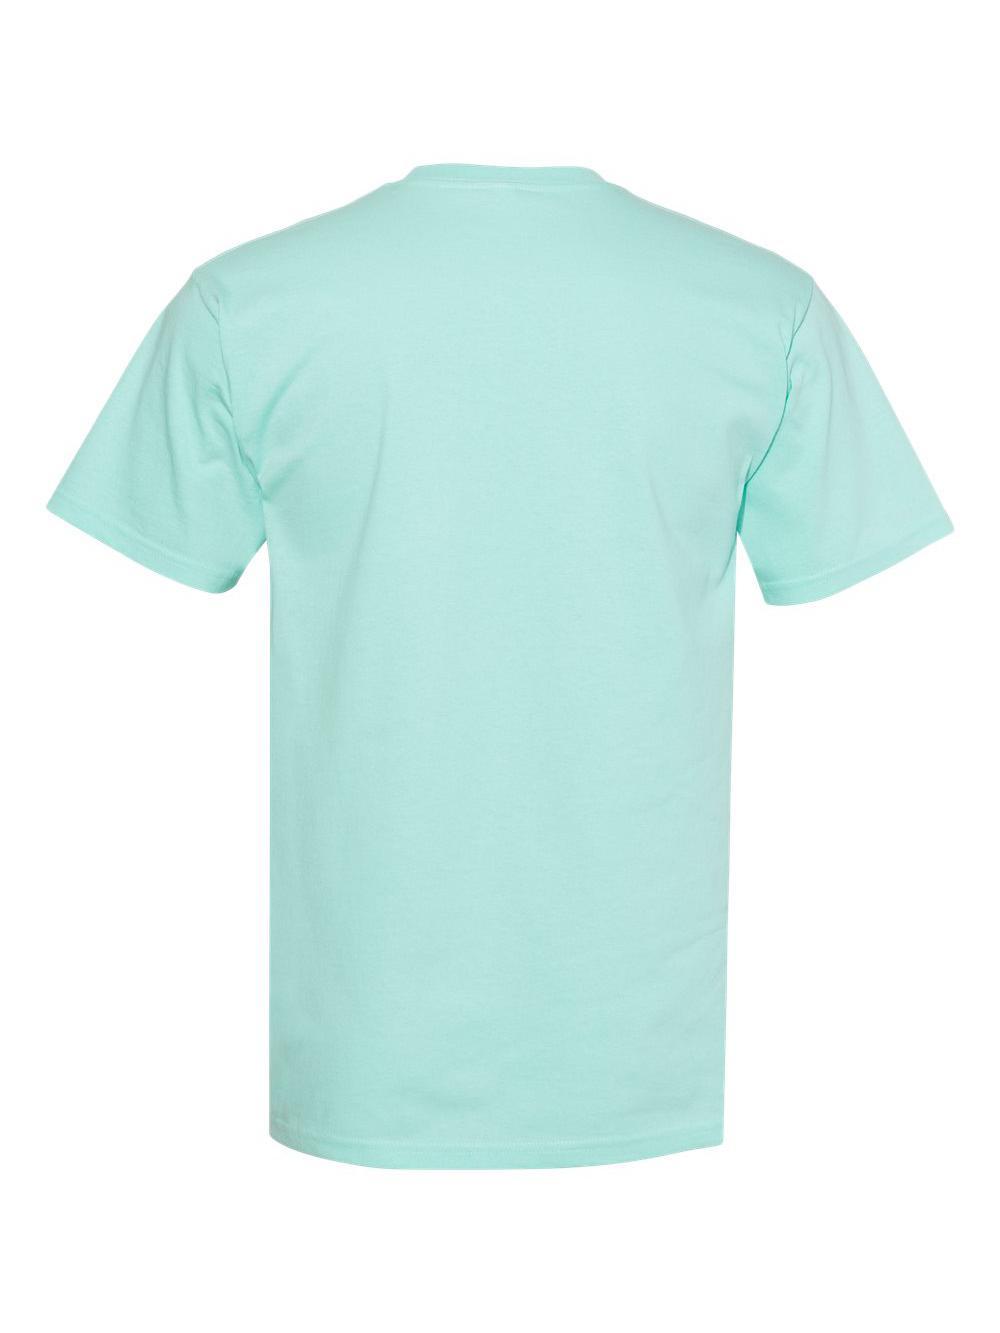 ALSTYLE-Premium-T-Shirt-1701 thumbnail 22